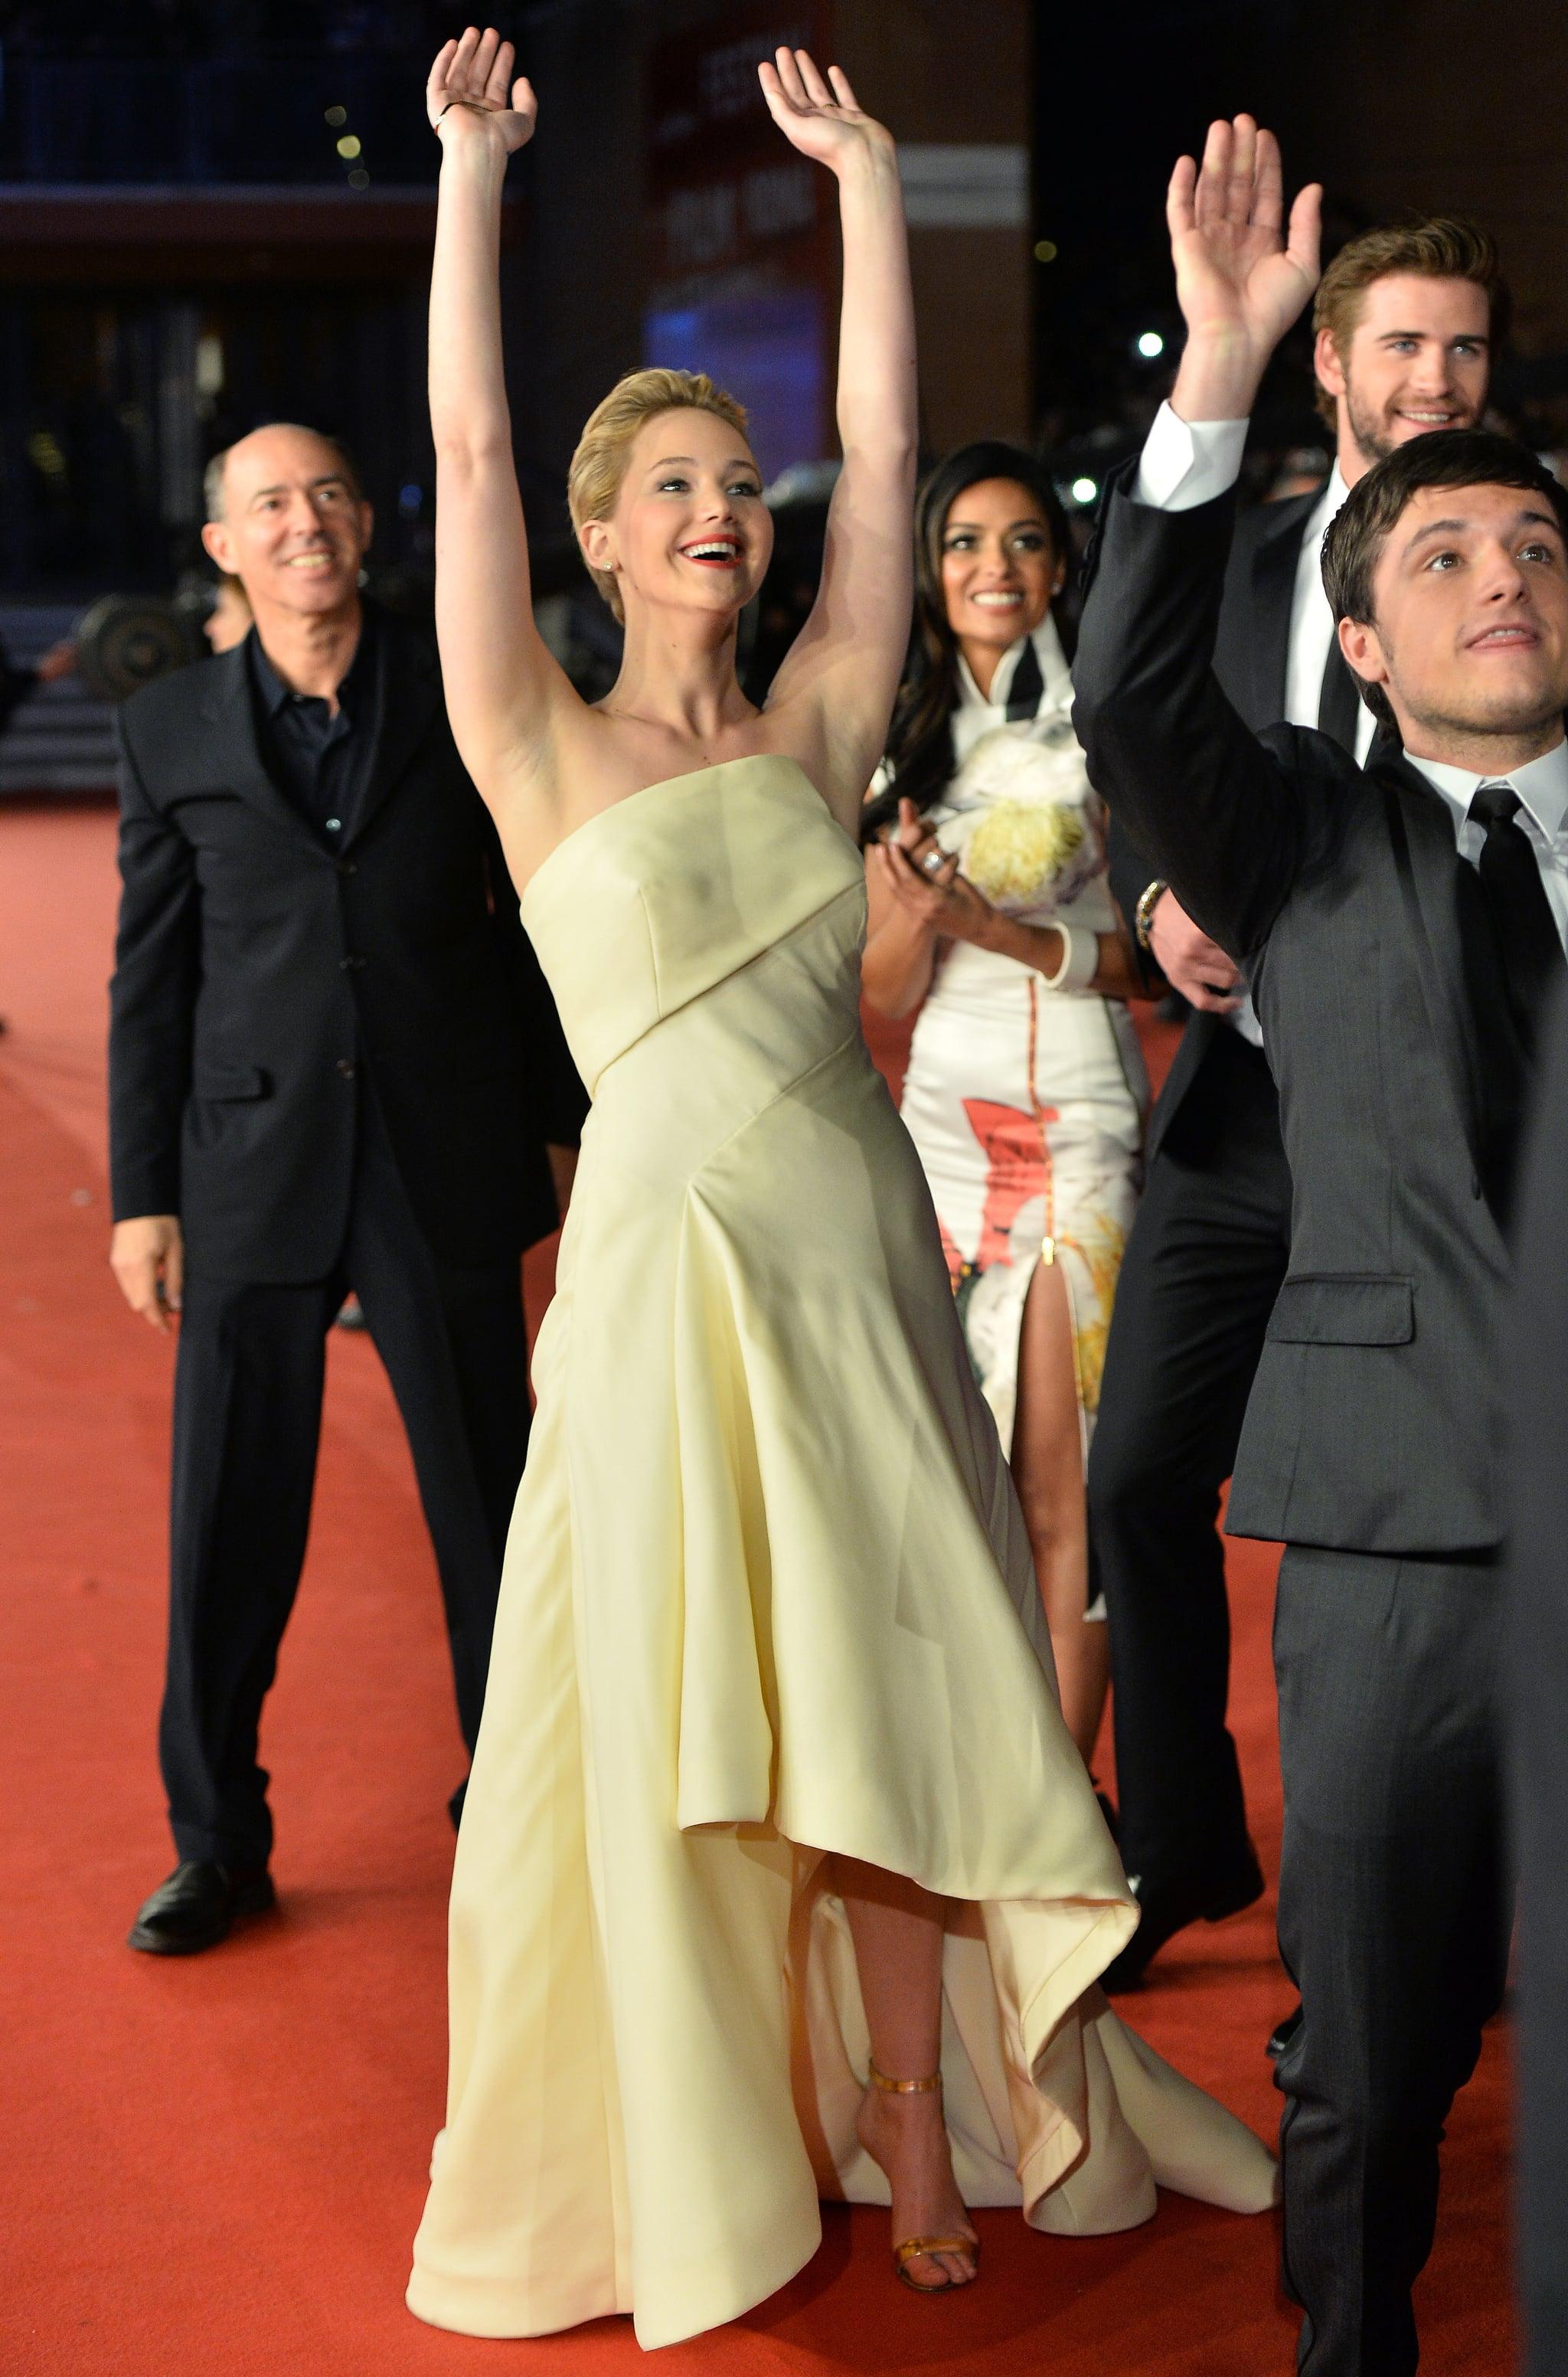 Jennifer Lawrence amd Josh Hutcherson Doing the Wave